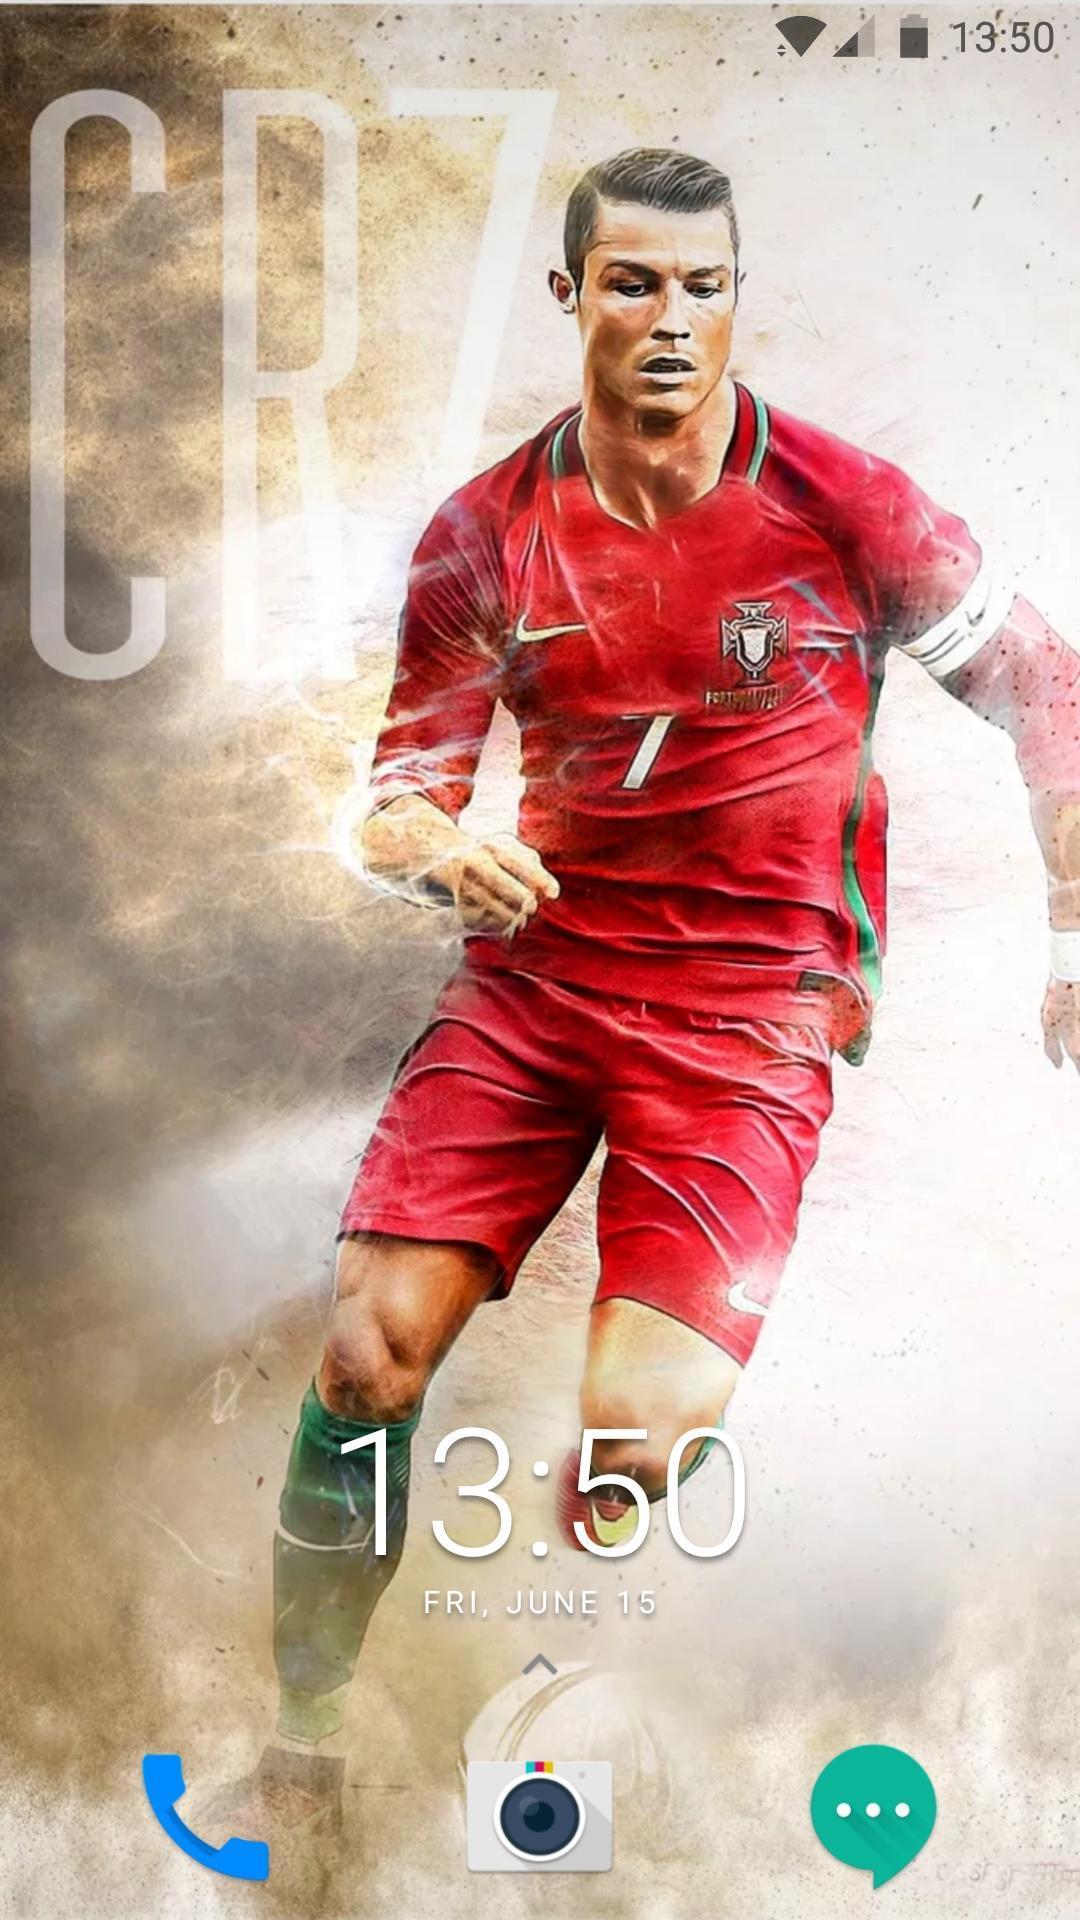 Cristiano Ronaldo Cr7 Wallpaper Football Wallpaper For